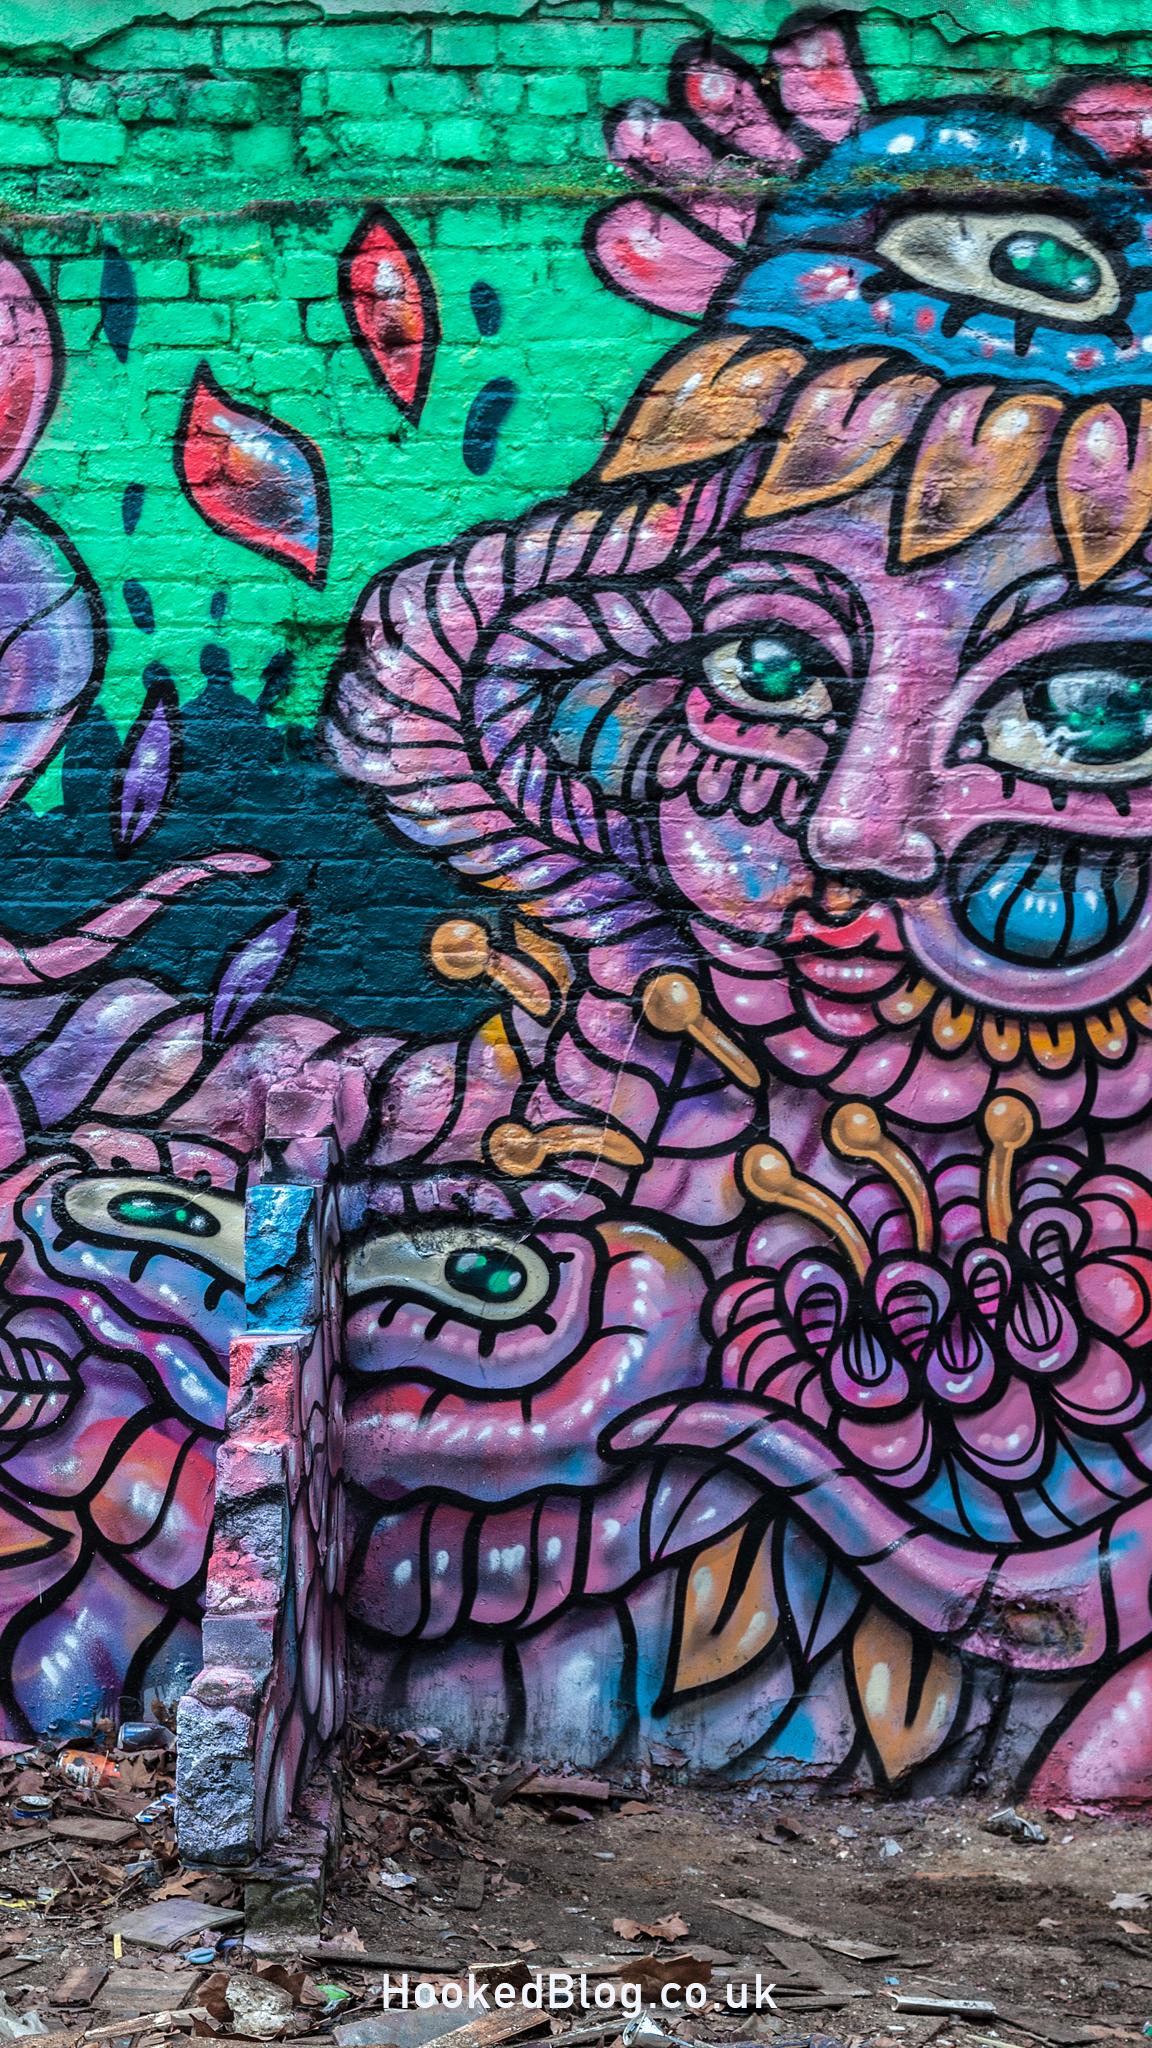 Brick Lane Street Art Mural painted by Amara Por Dios. Photo ©Hookedblog / Mark Rigney